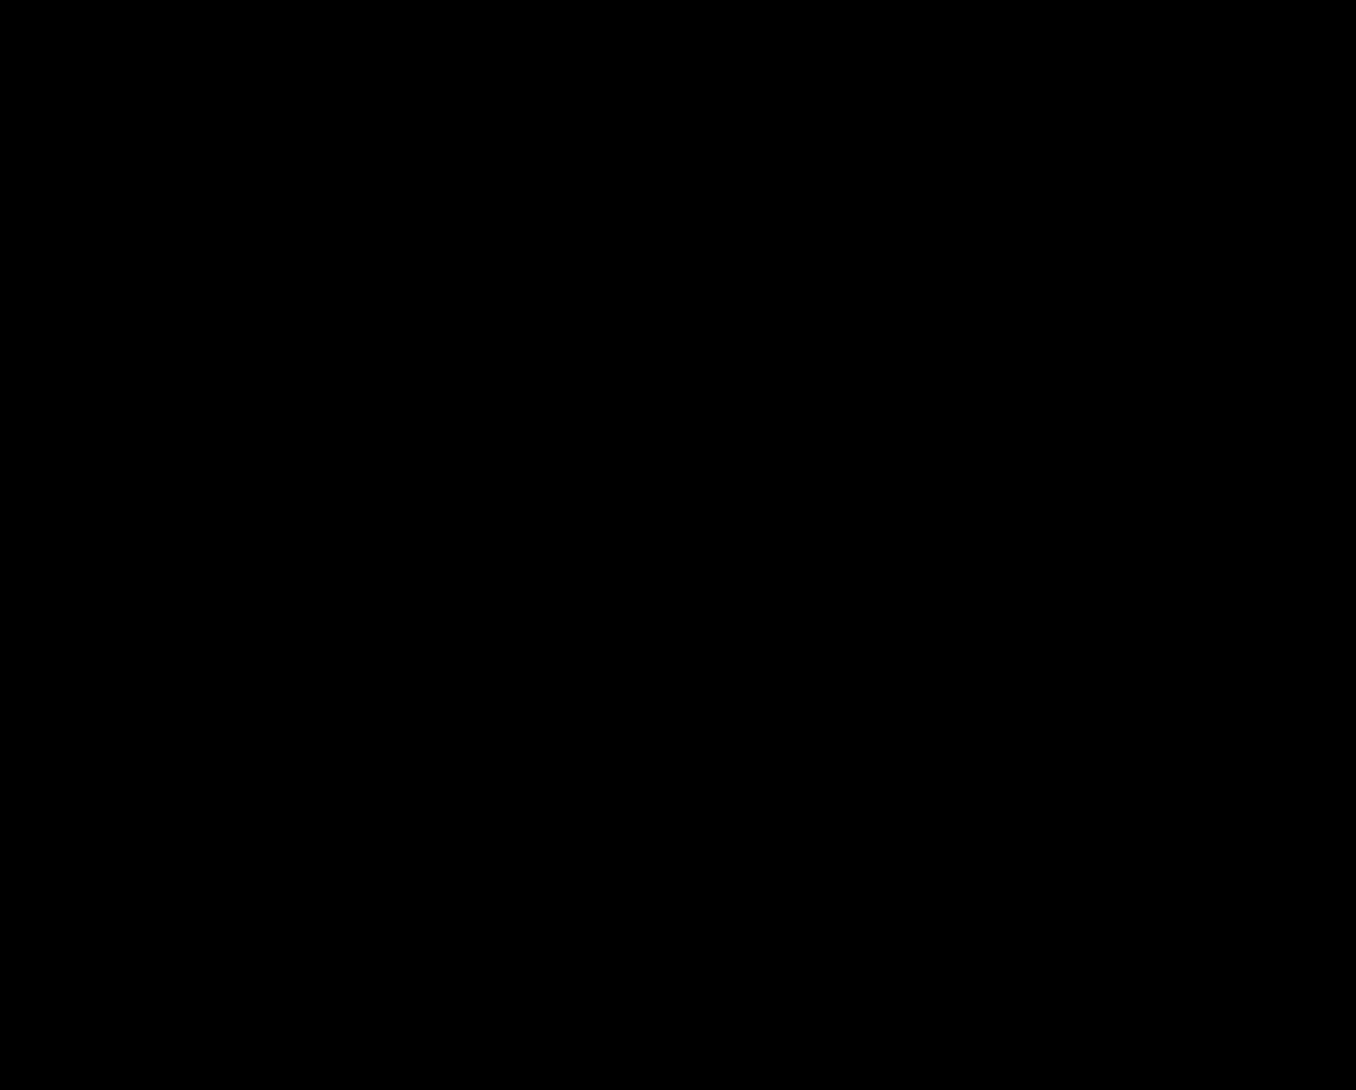 logo-black%20(2)_edited_edited.png